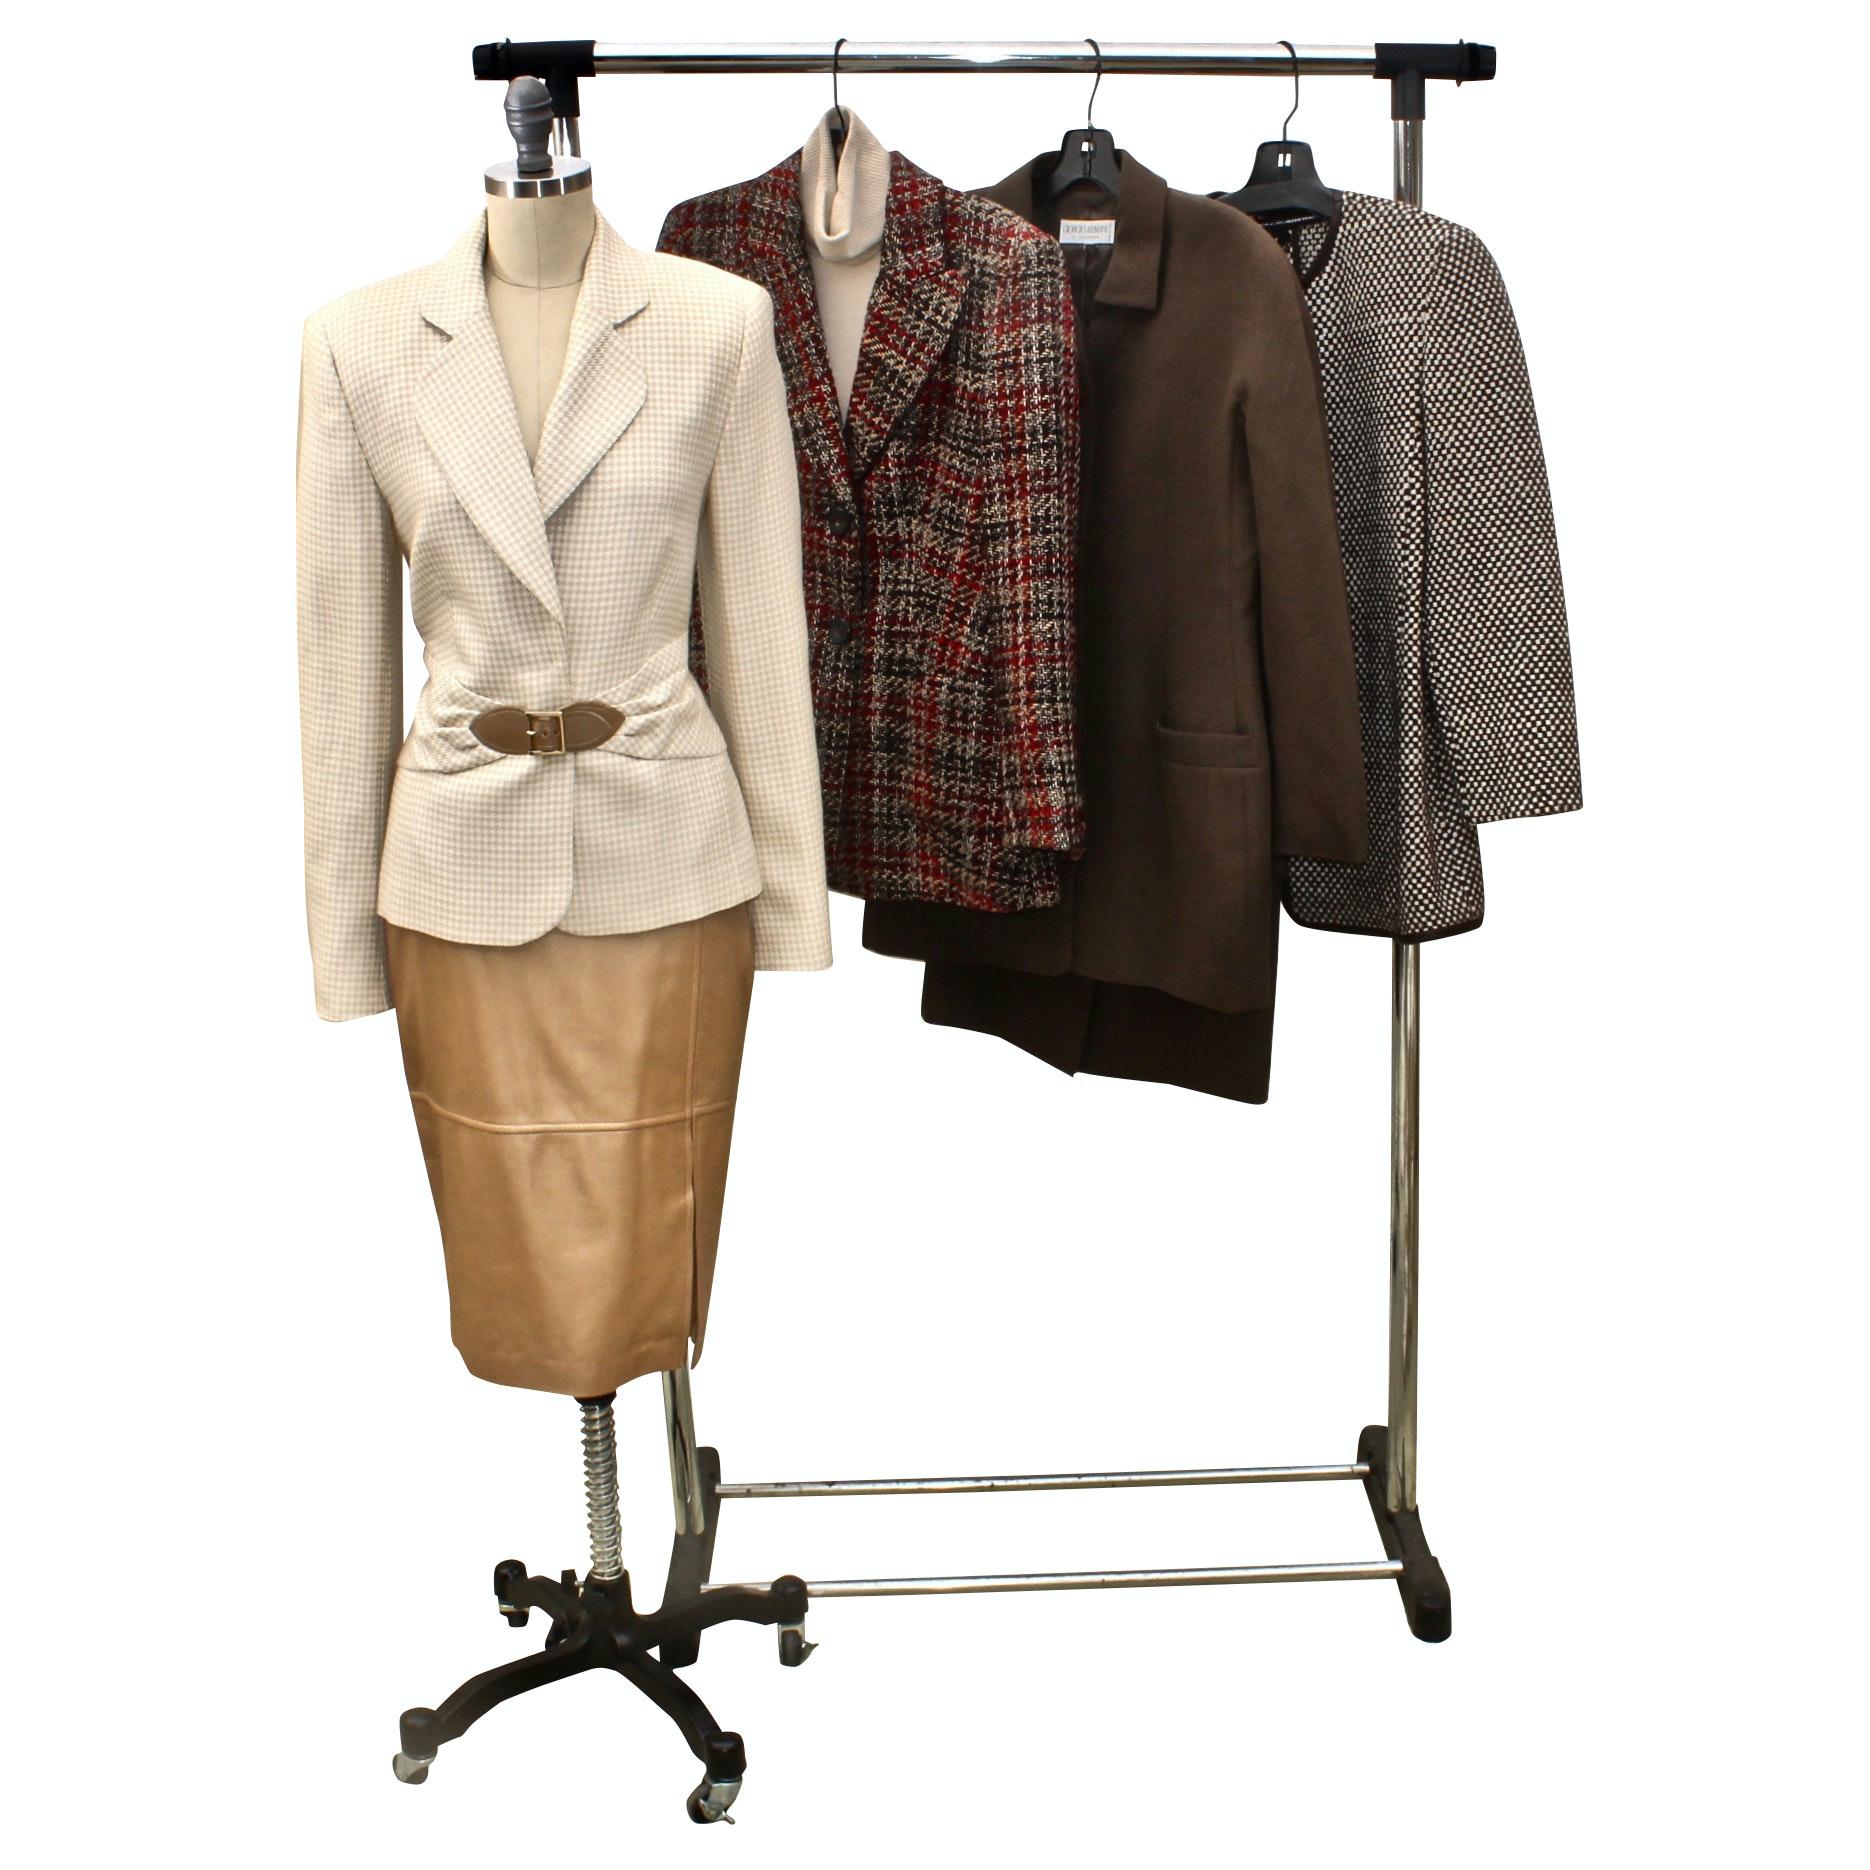 Women's Jackets and Separates Including Giorgio Armani, Escada and More